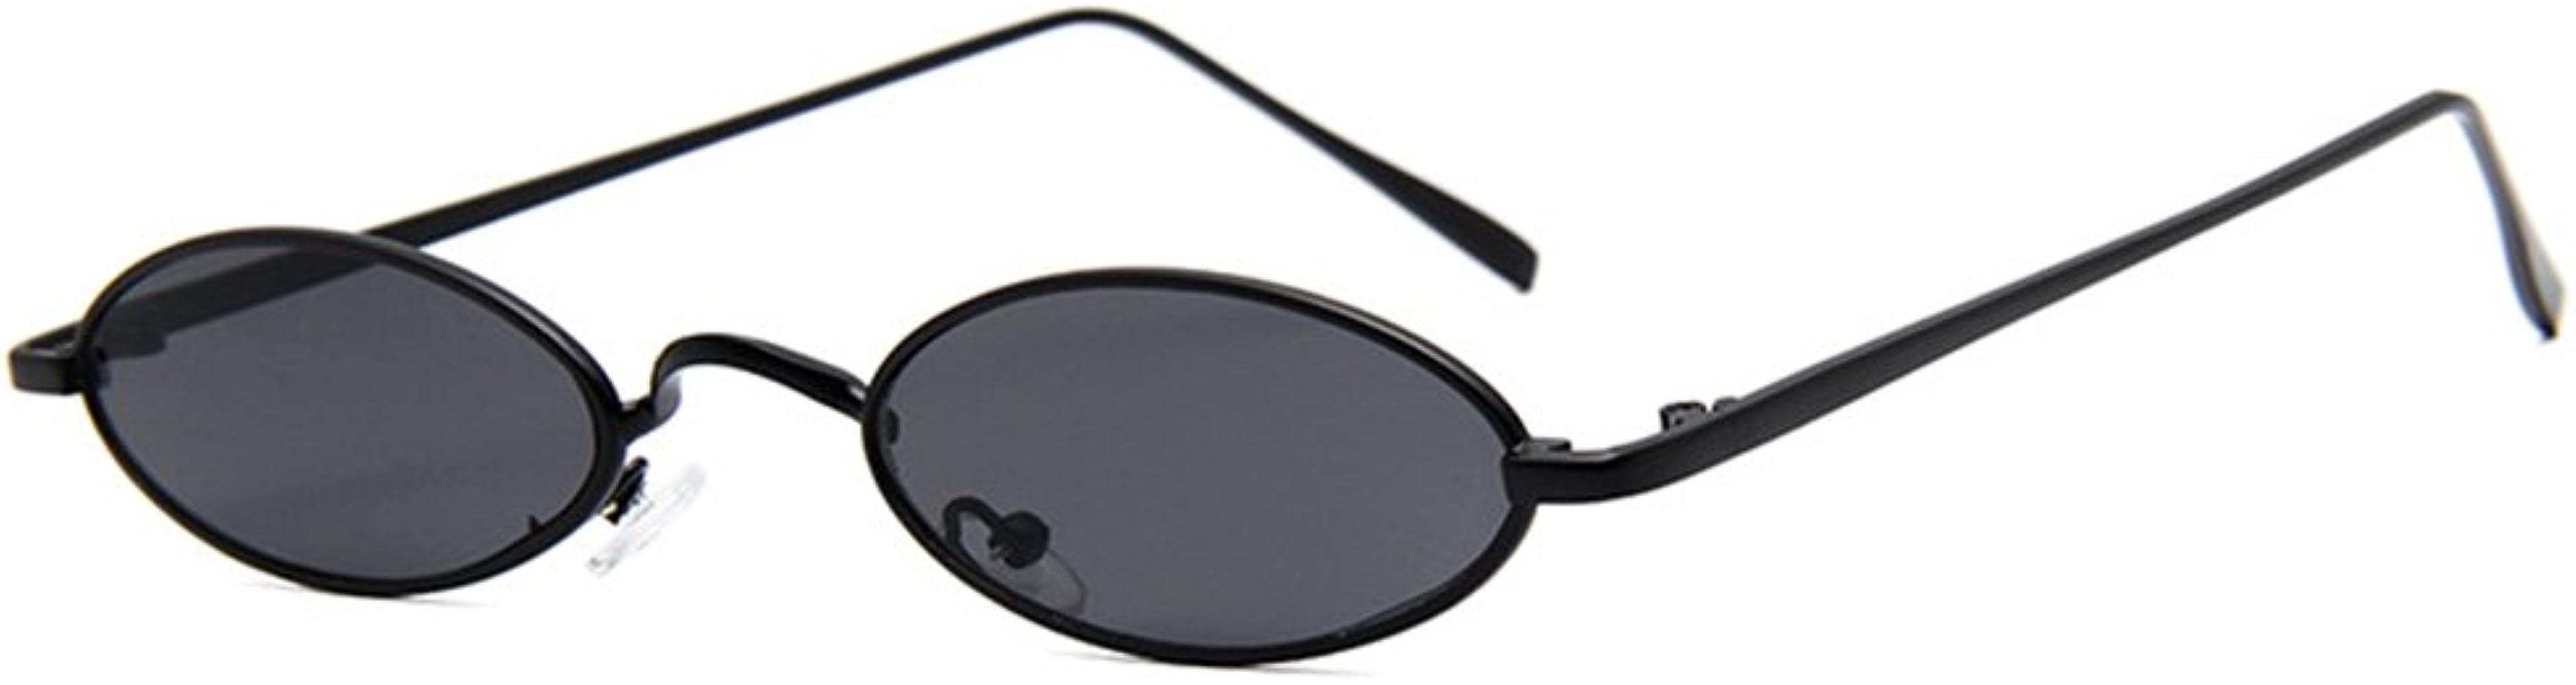 Gafas negro negro Oval